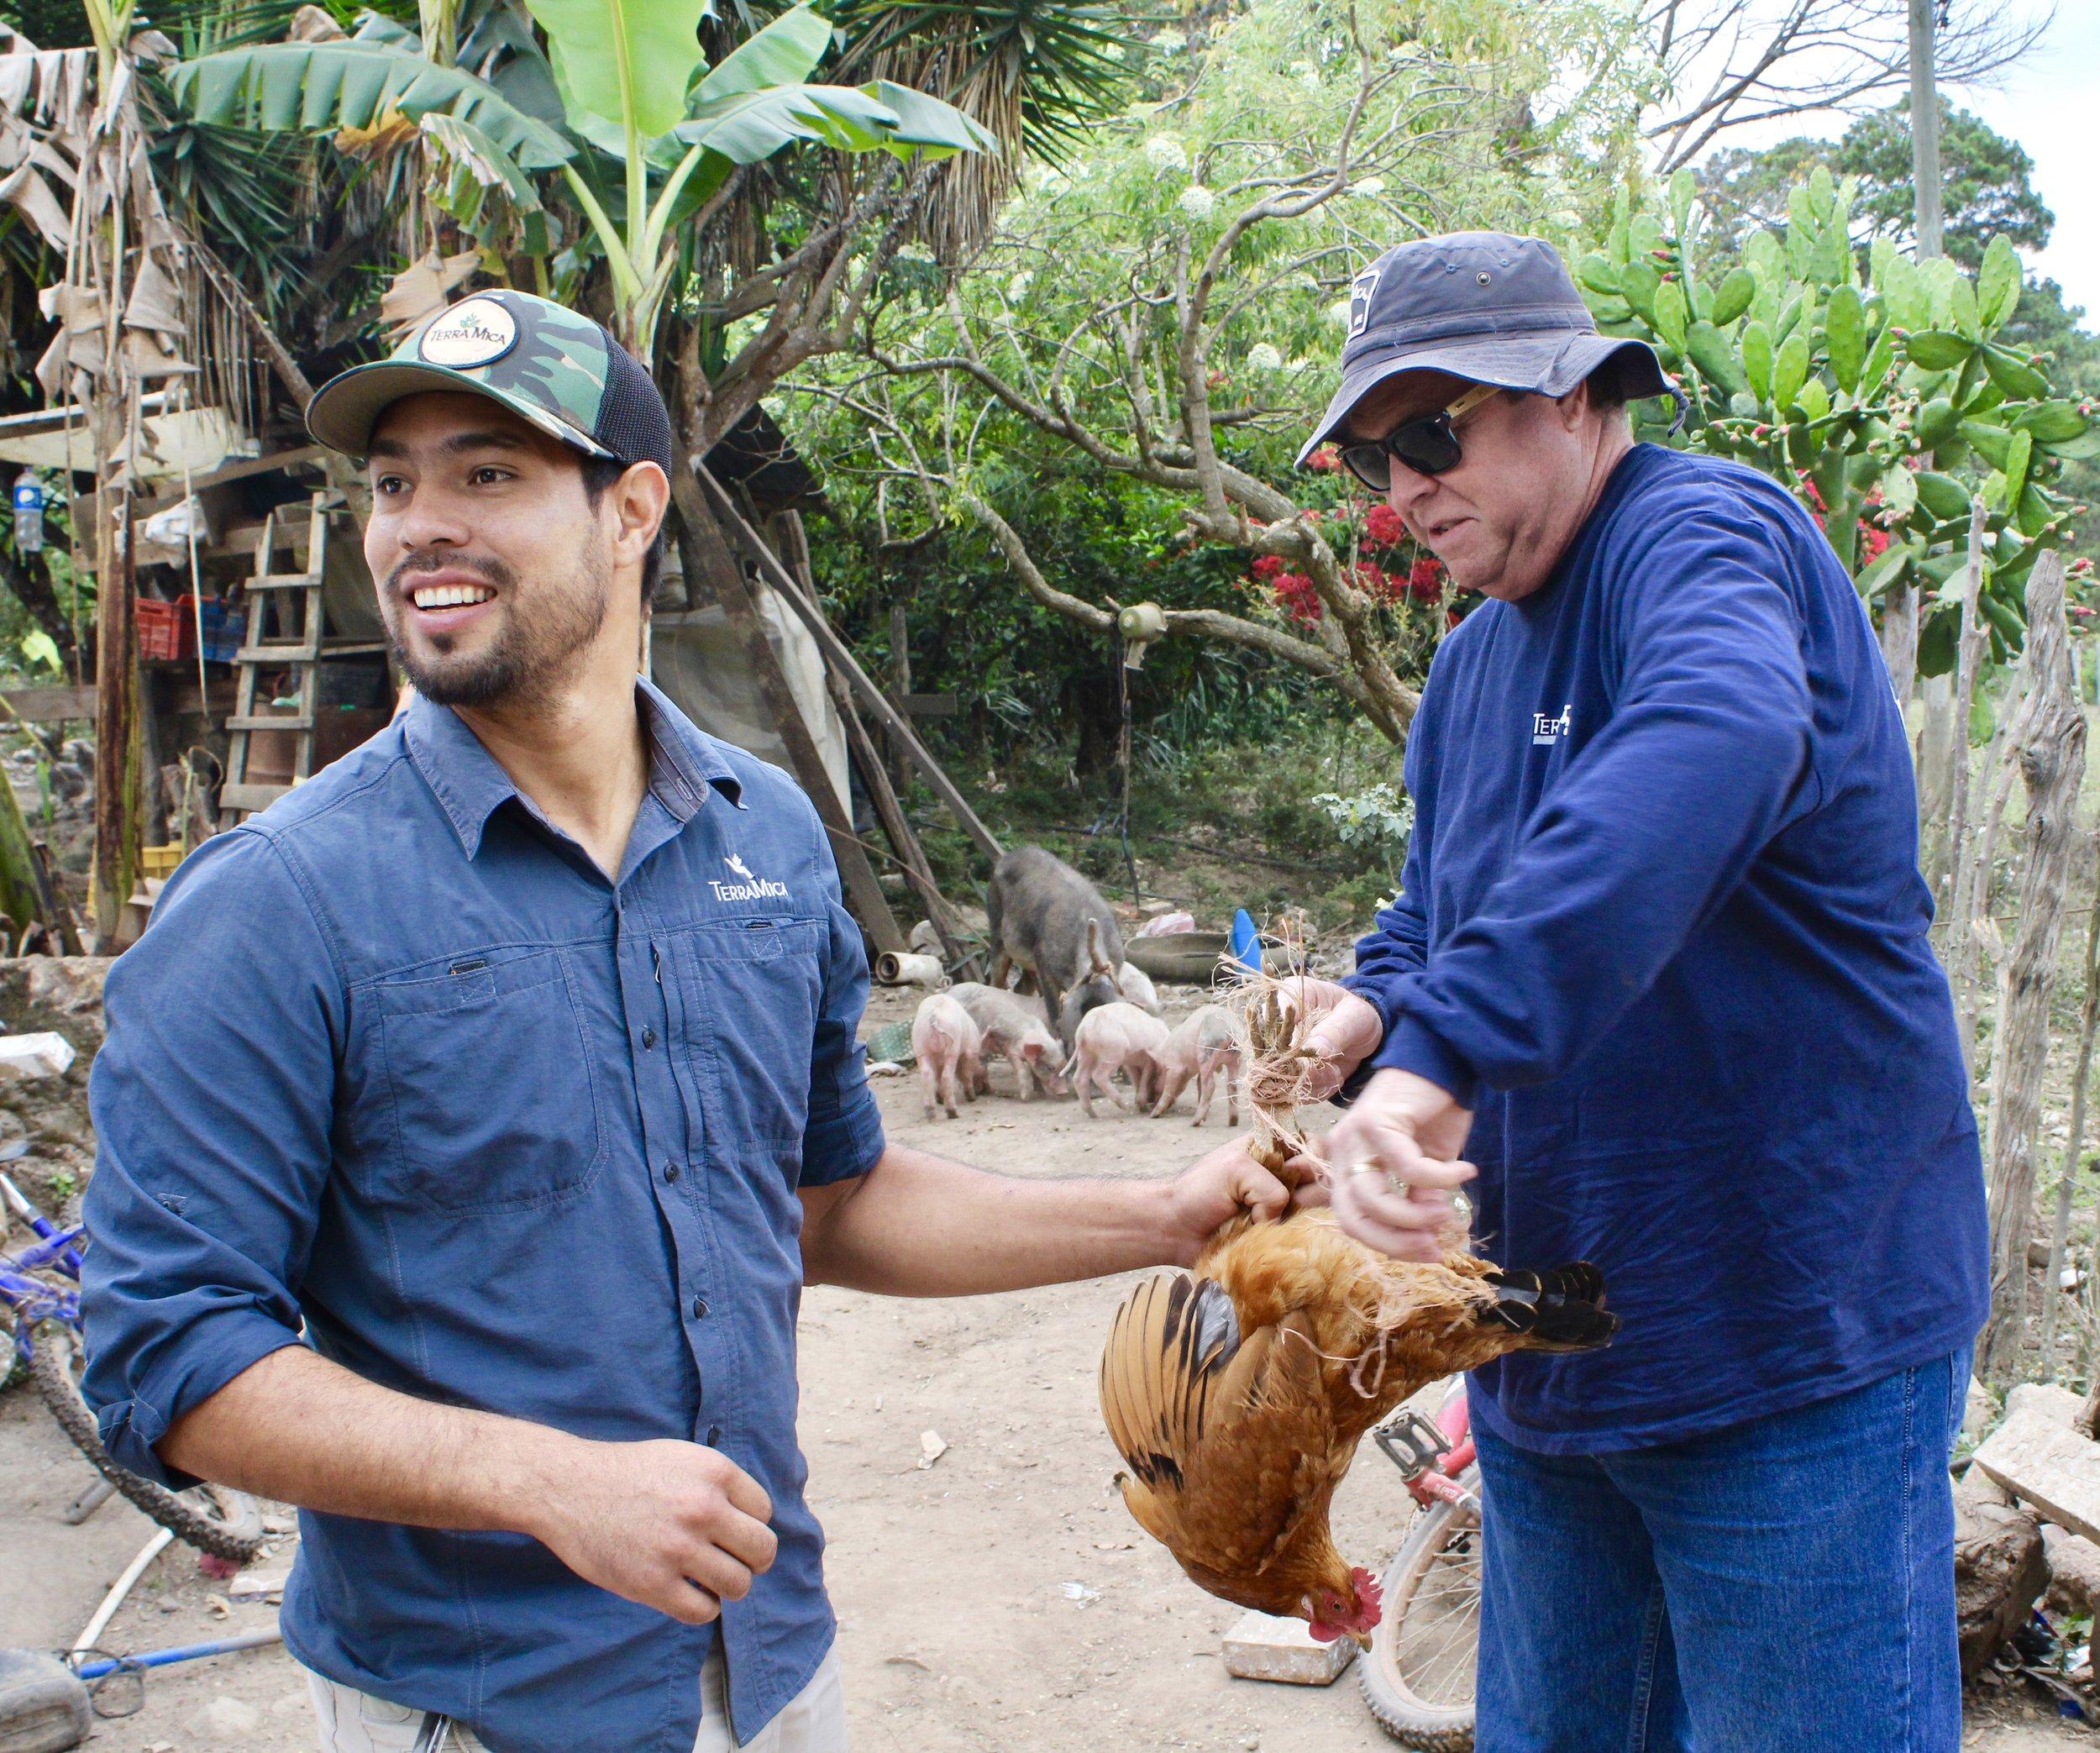 Men on Farm with Chicken